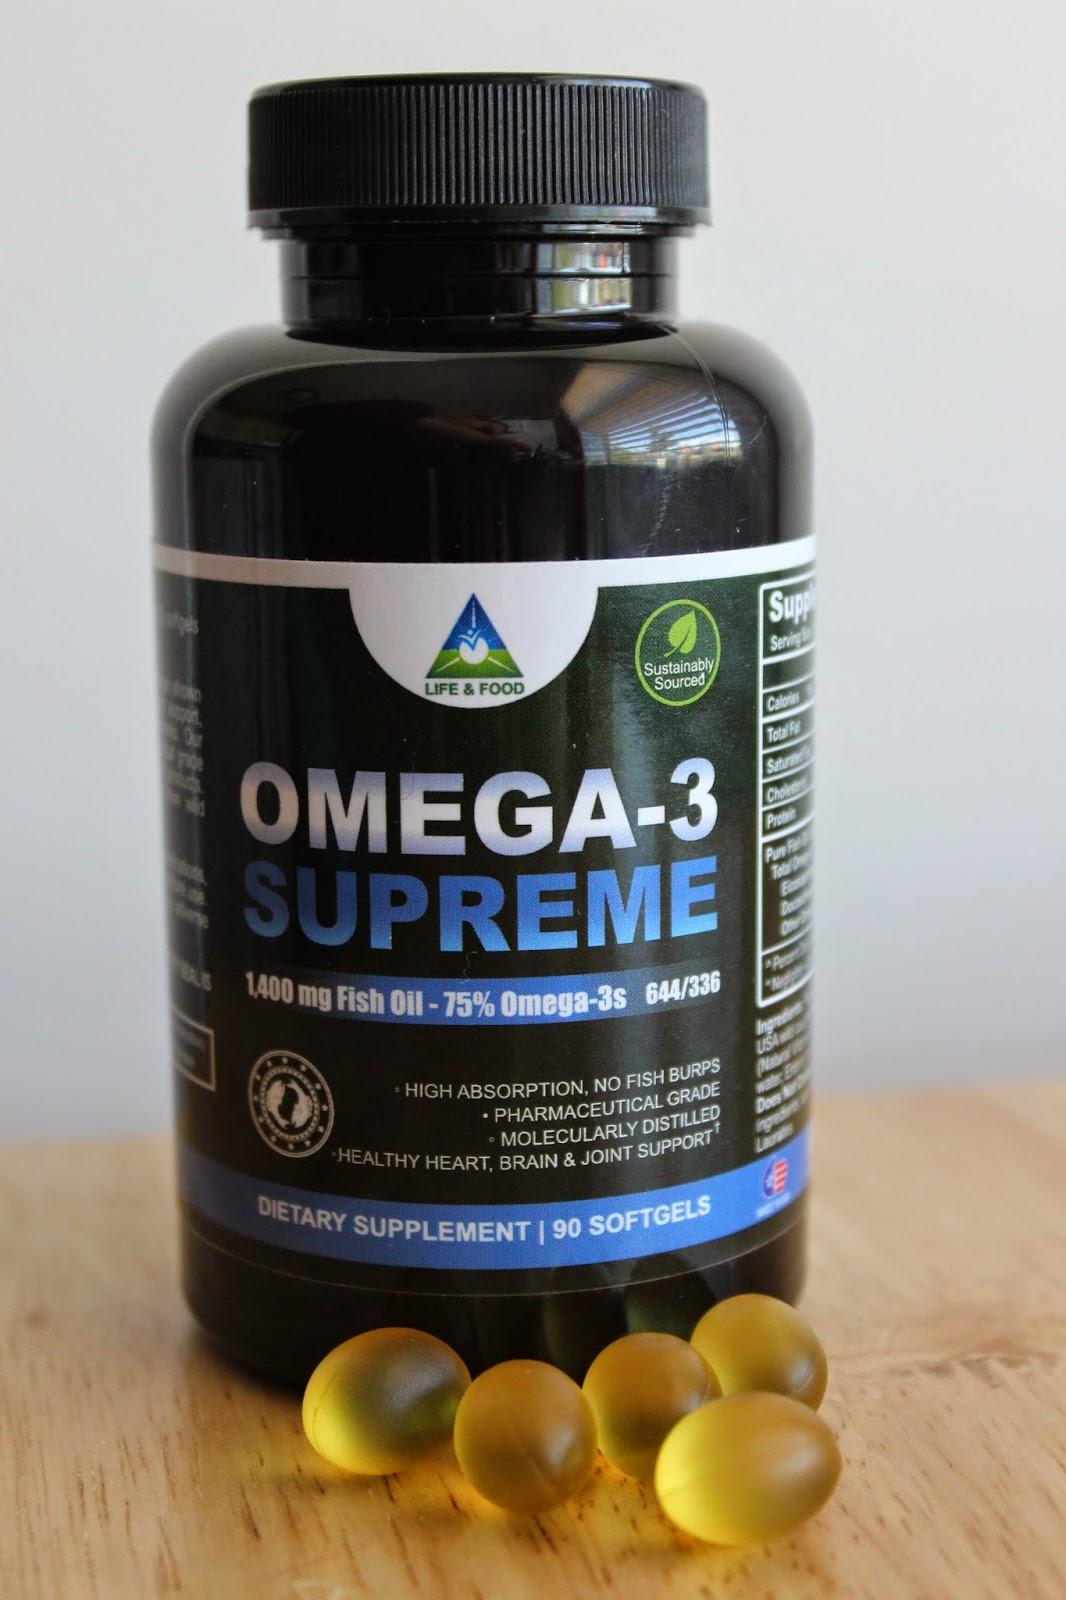 A sampling bee life food omega 3 supreme 1400mg fish for Fish oil ratings